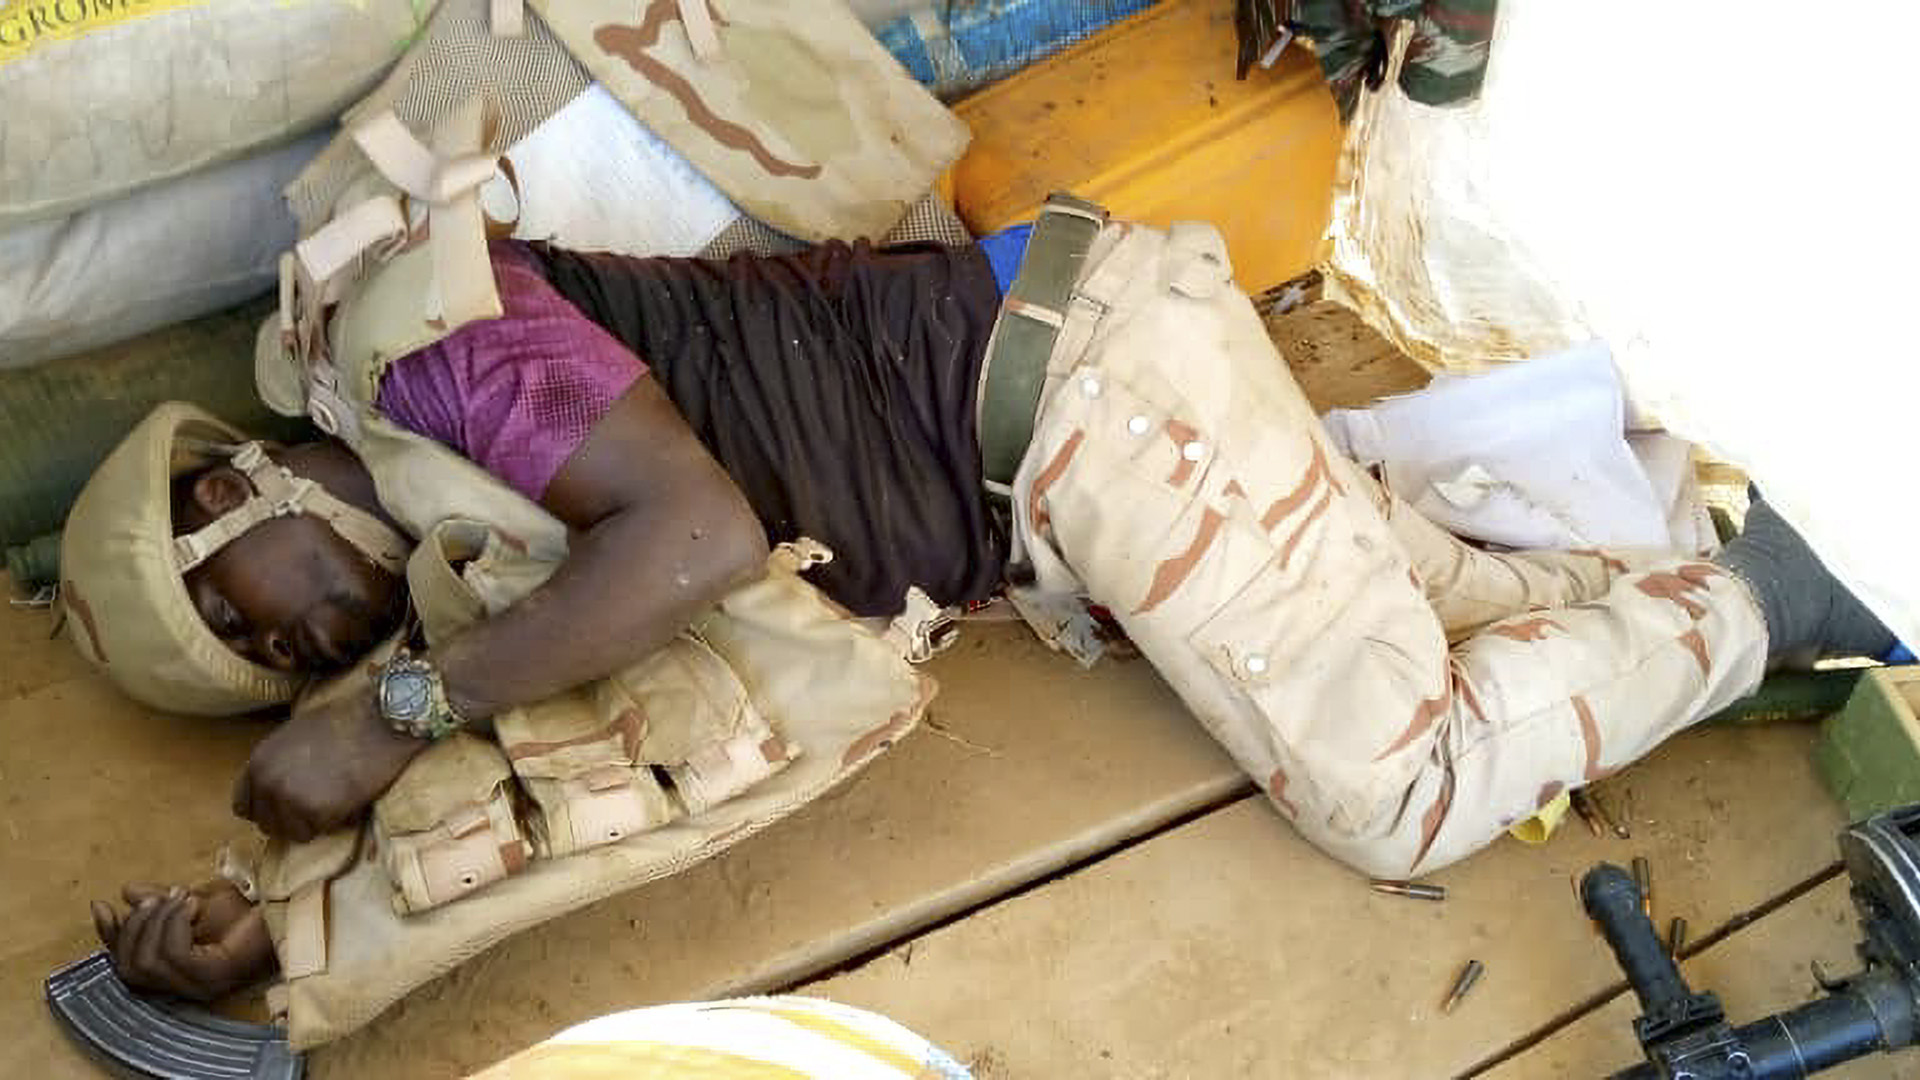 Cameroon Swears Revenge On Boko Haram For Killing 13 Soldiers